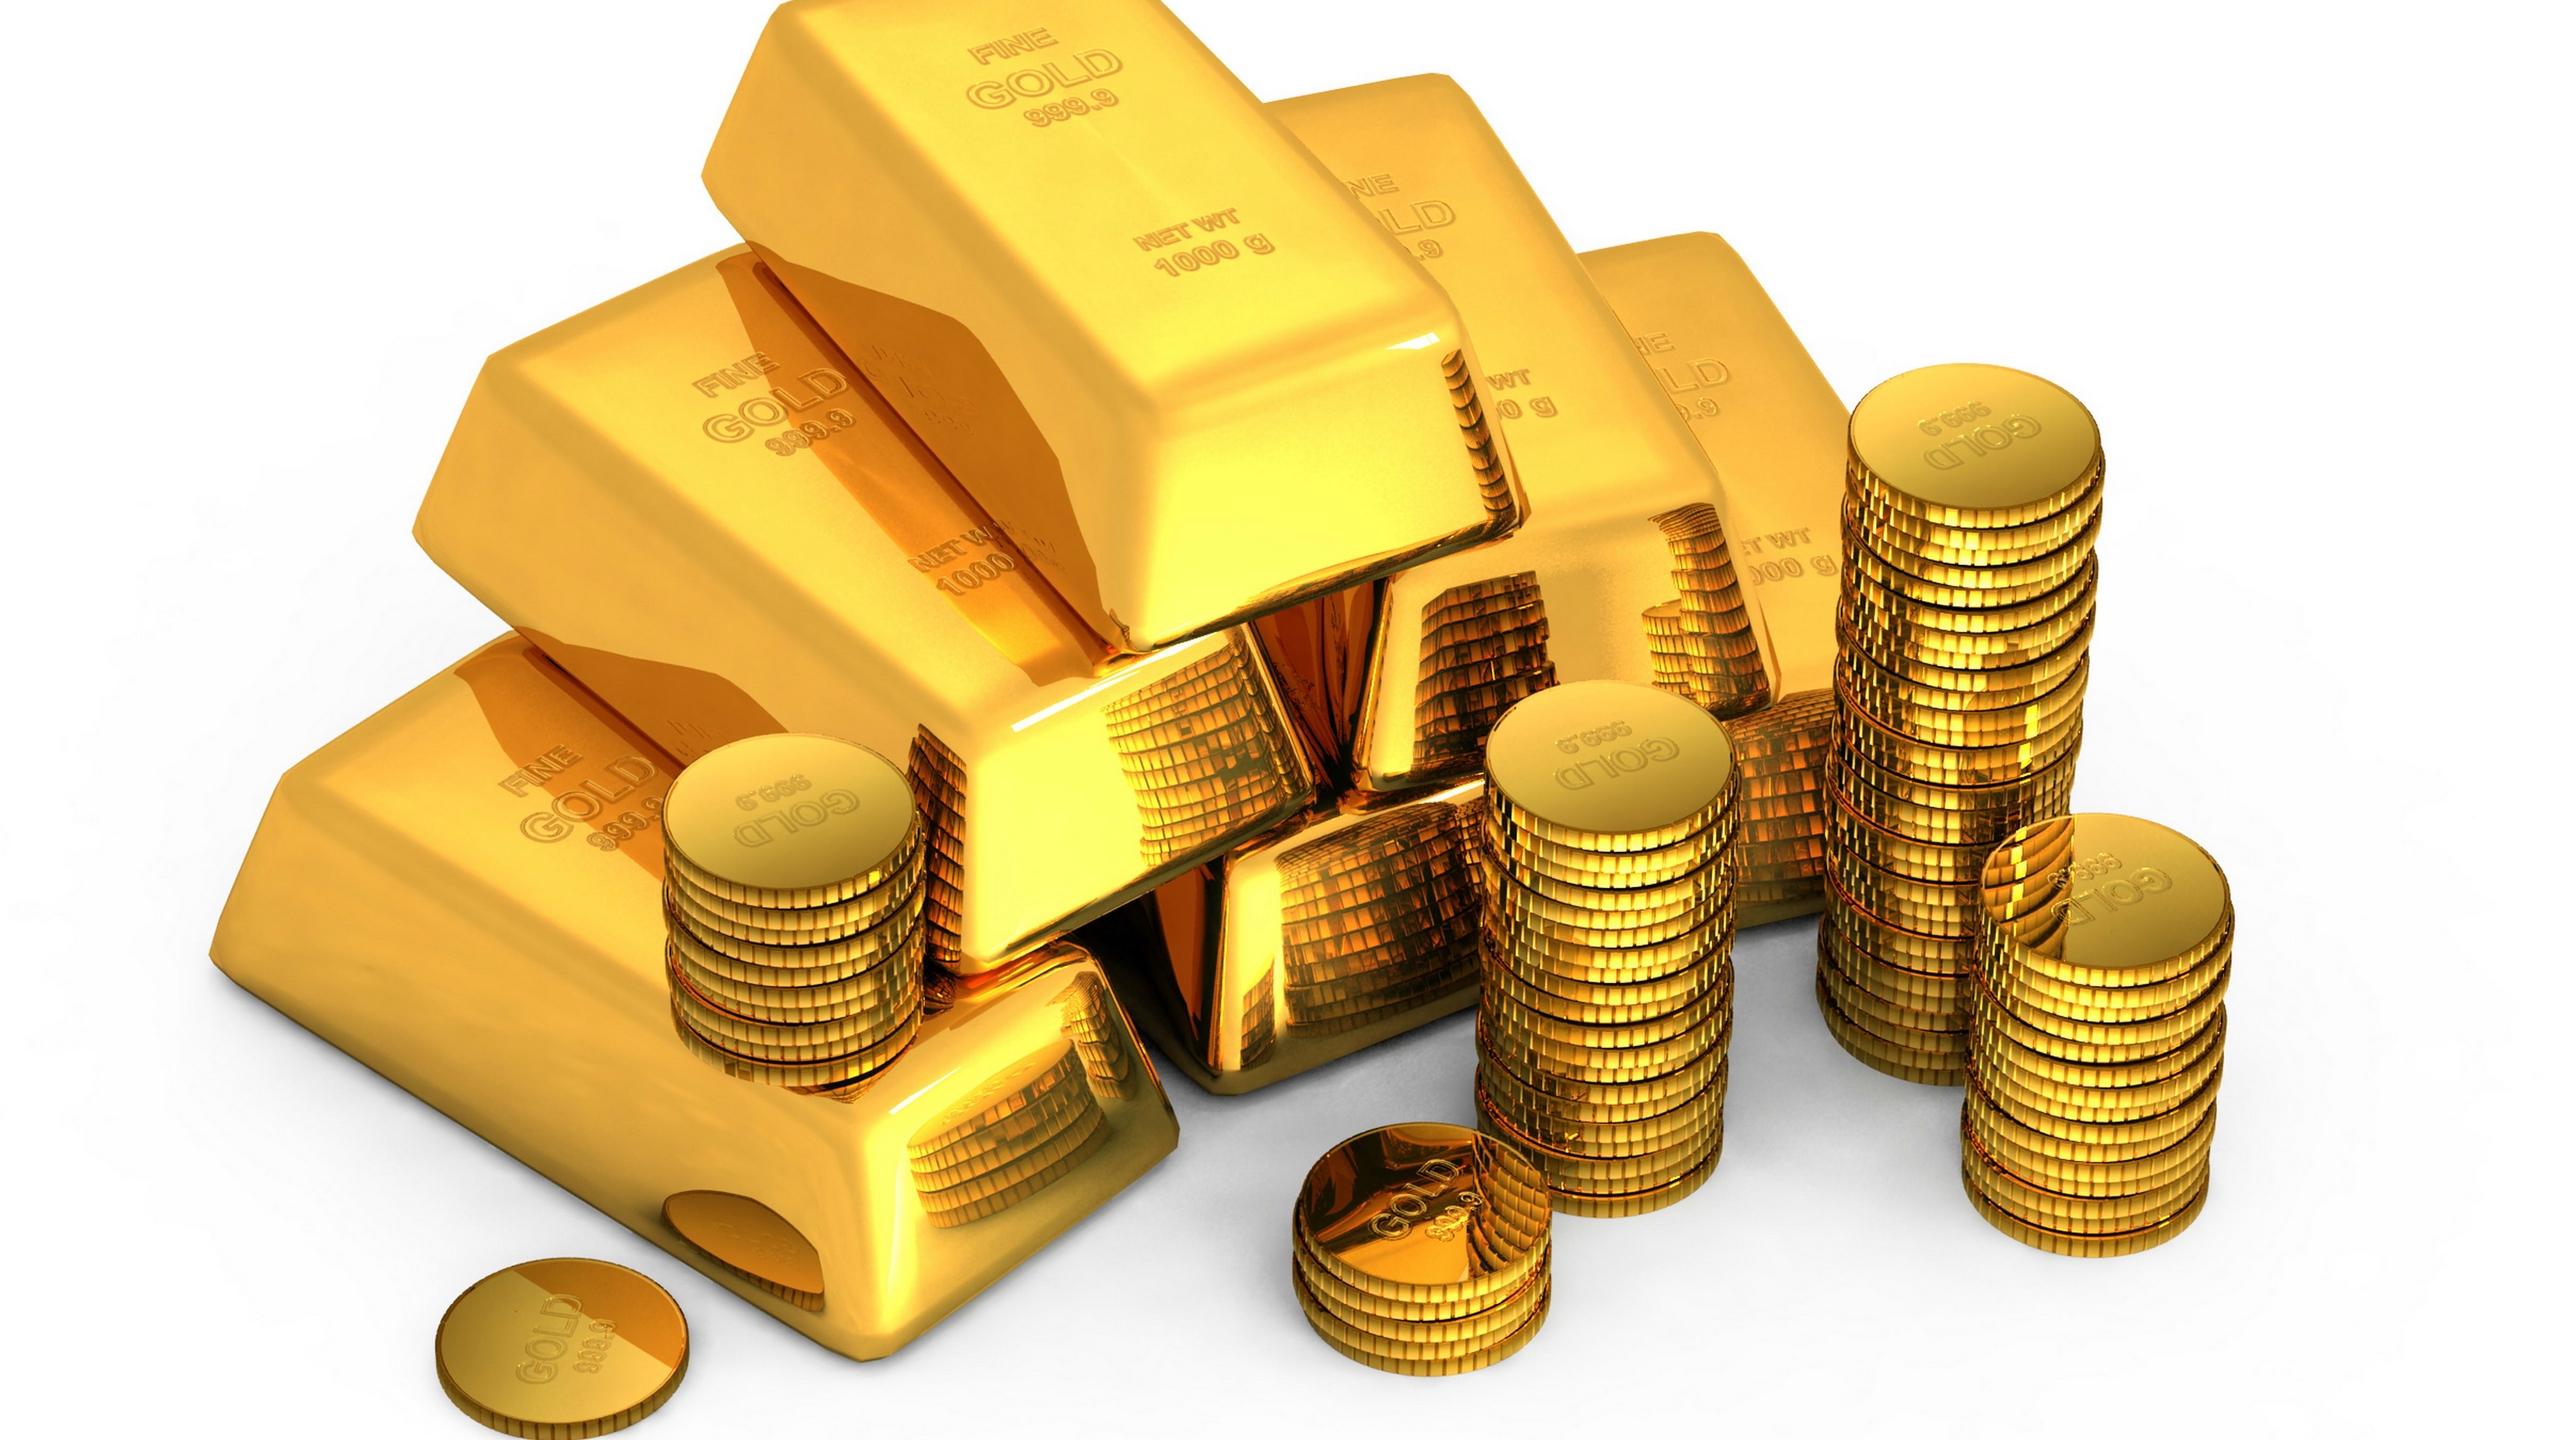 Wallpaper Gold Bullion Coins White Background Money 2560x1440